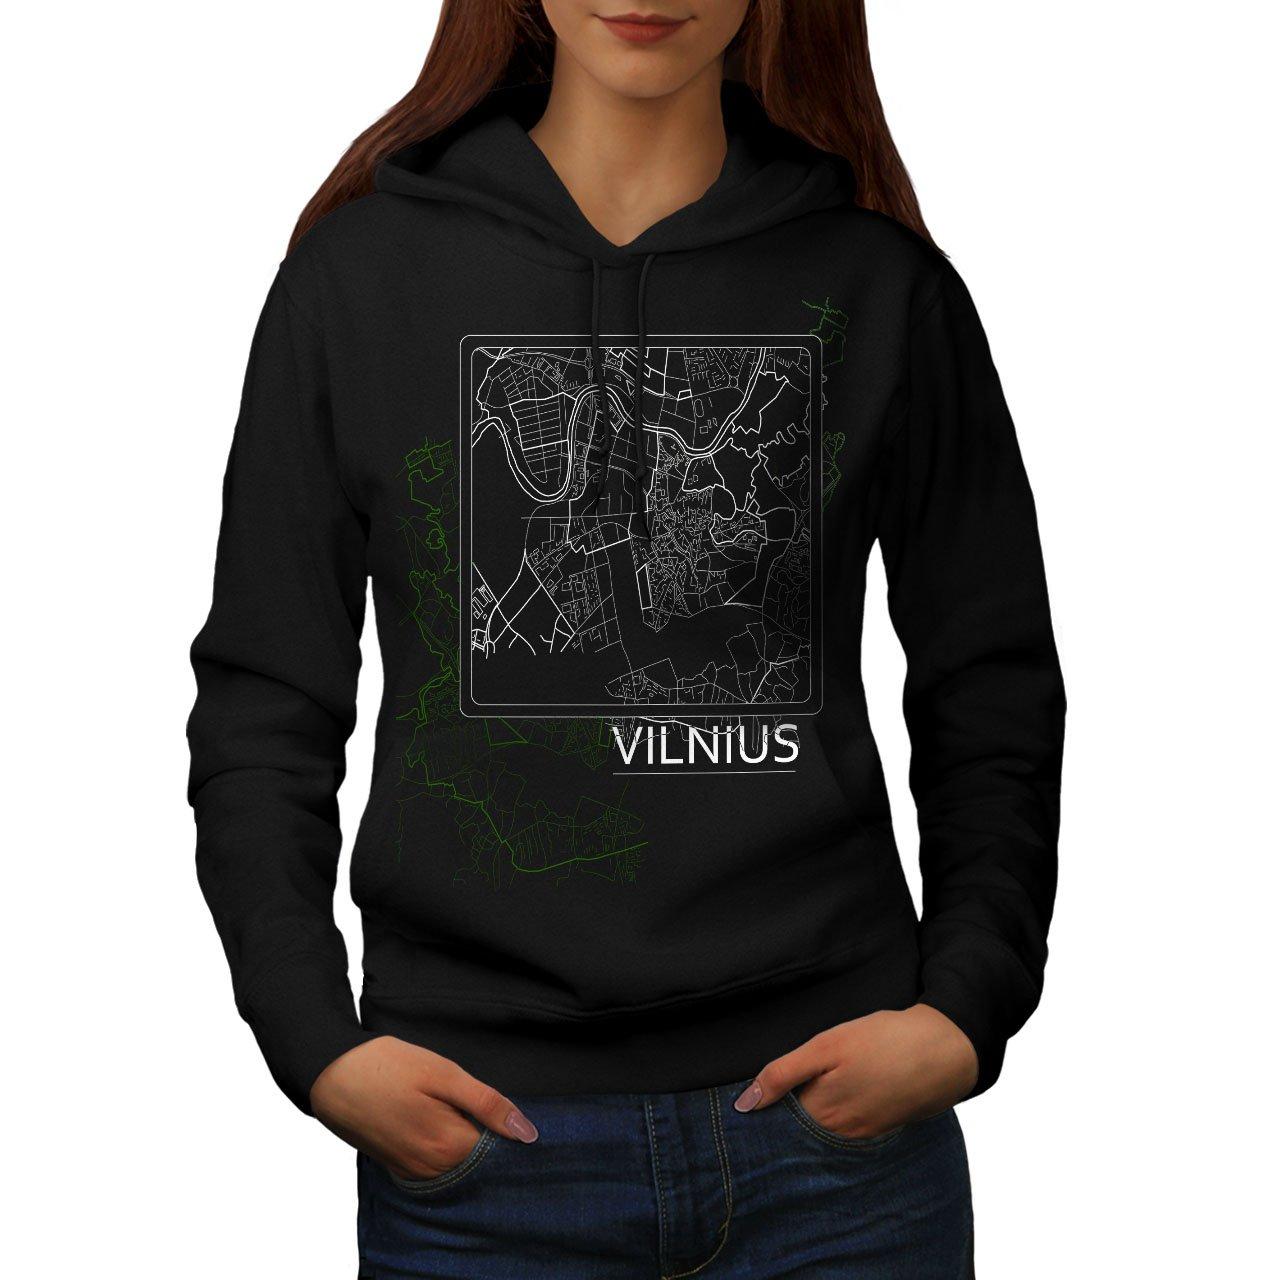 wellcoda Born Make History Mens Sweatshirt Cool Casual Jumper